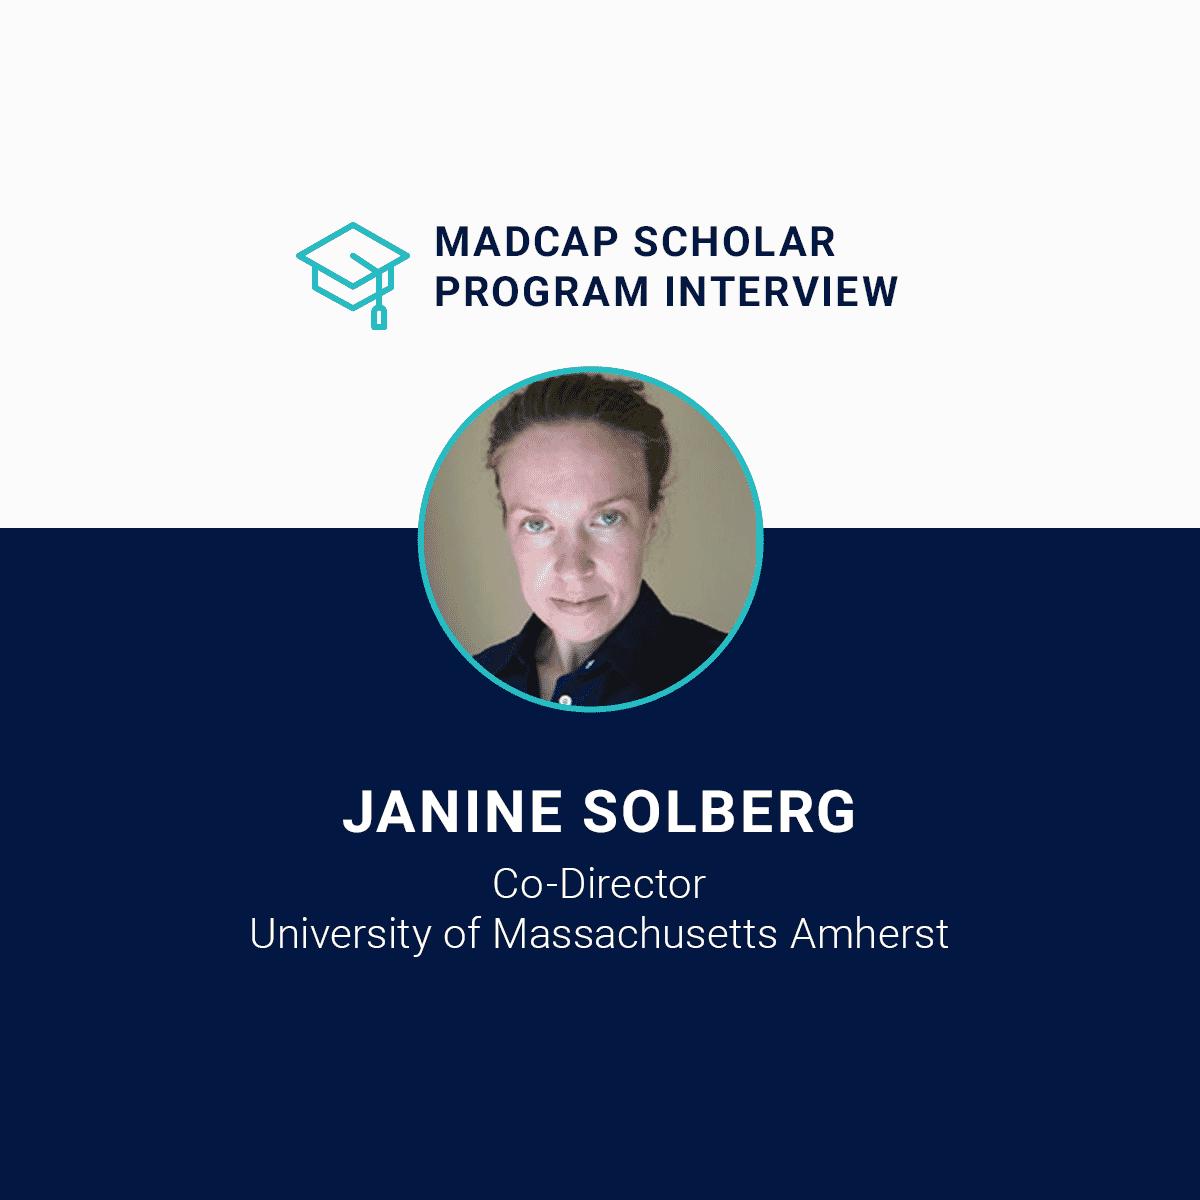 MadCap Scholar Program Interview Janine Solberg